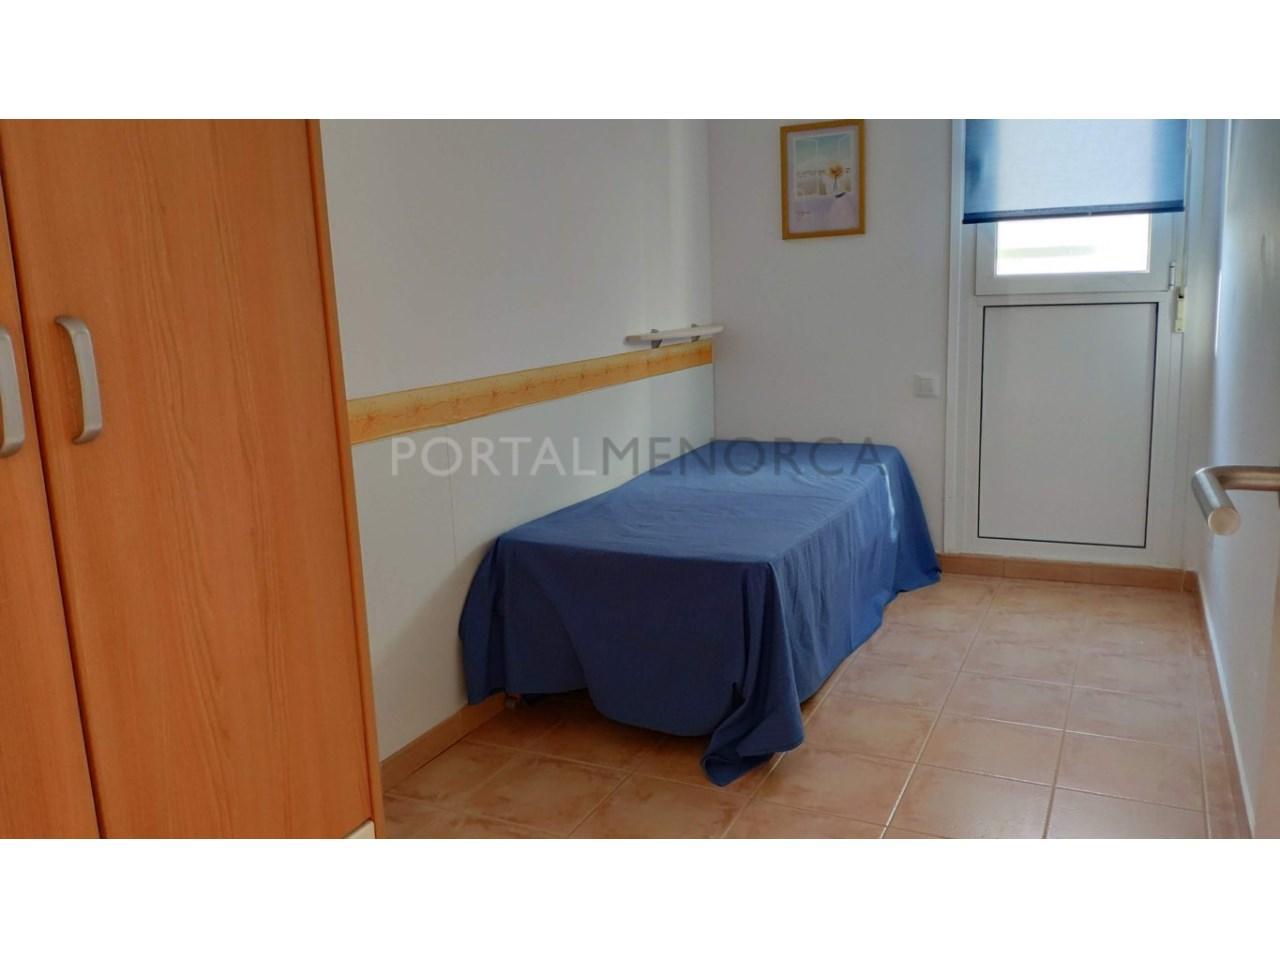 Frist floor apartament for sale in Ciutadella-Bedroom